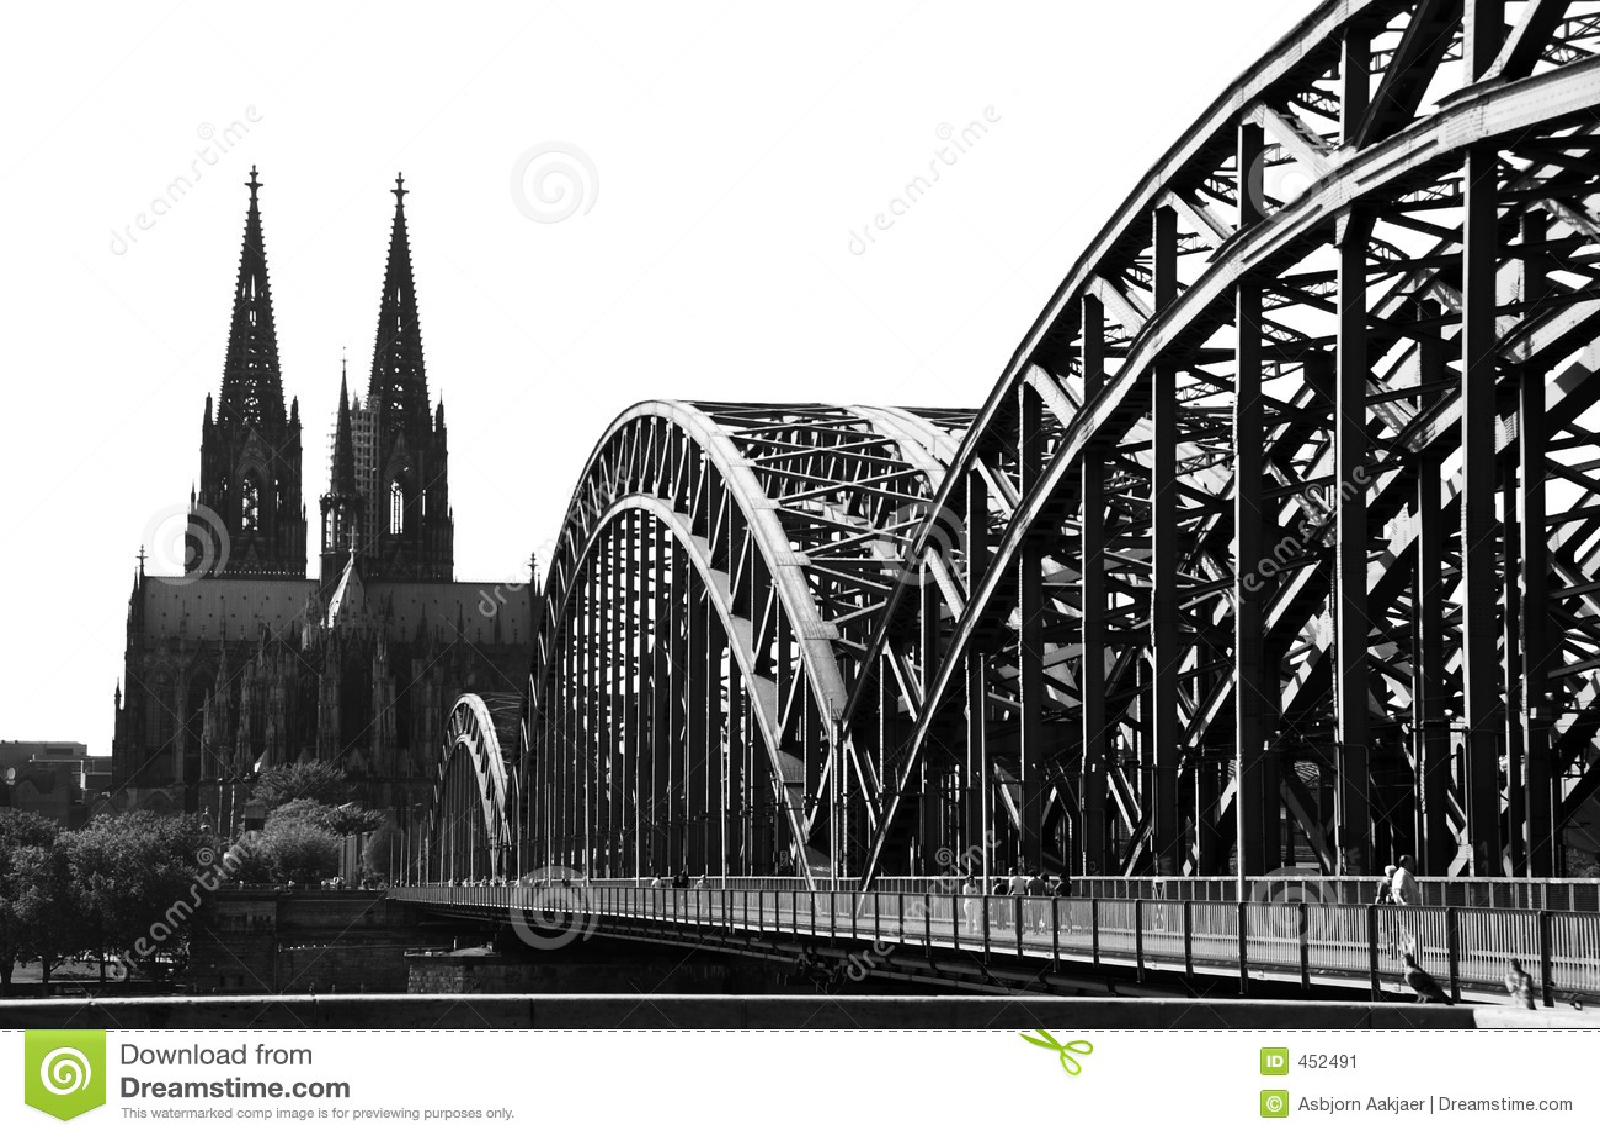 Stockbild: köln-brücke und kathedrale (b&;w)